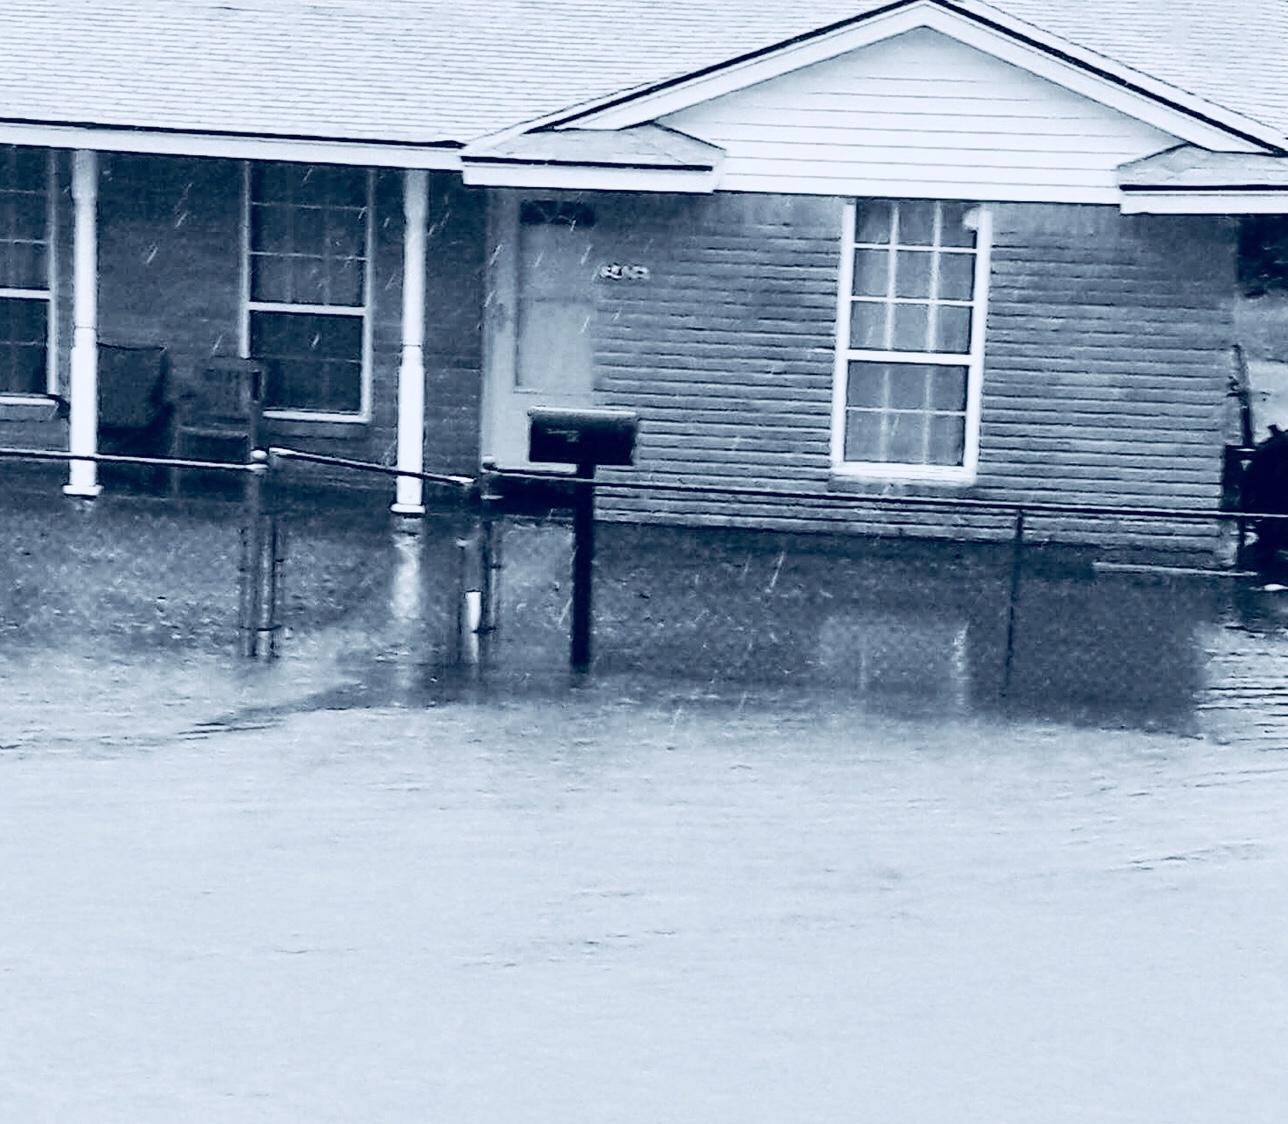 Galveston, Texas. Aug. 2017. Hurricane Harvey.